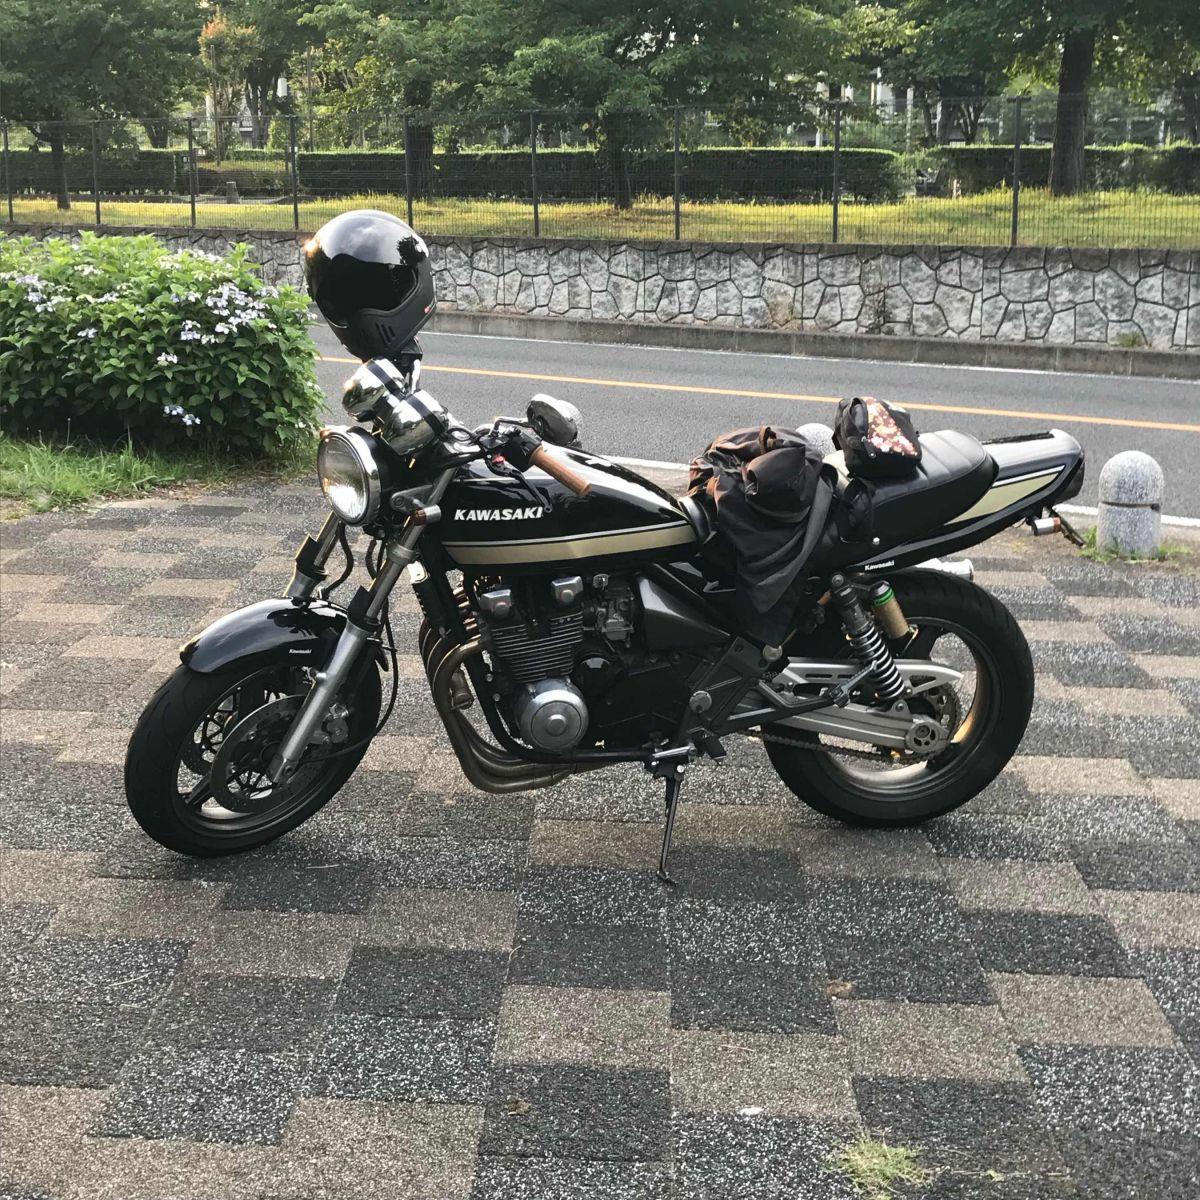 K.A.riderさんが投稿したバイクライフ